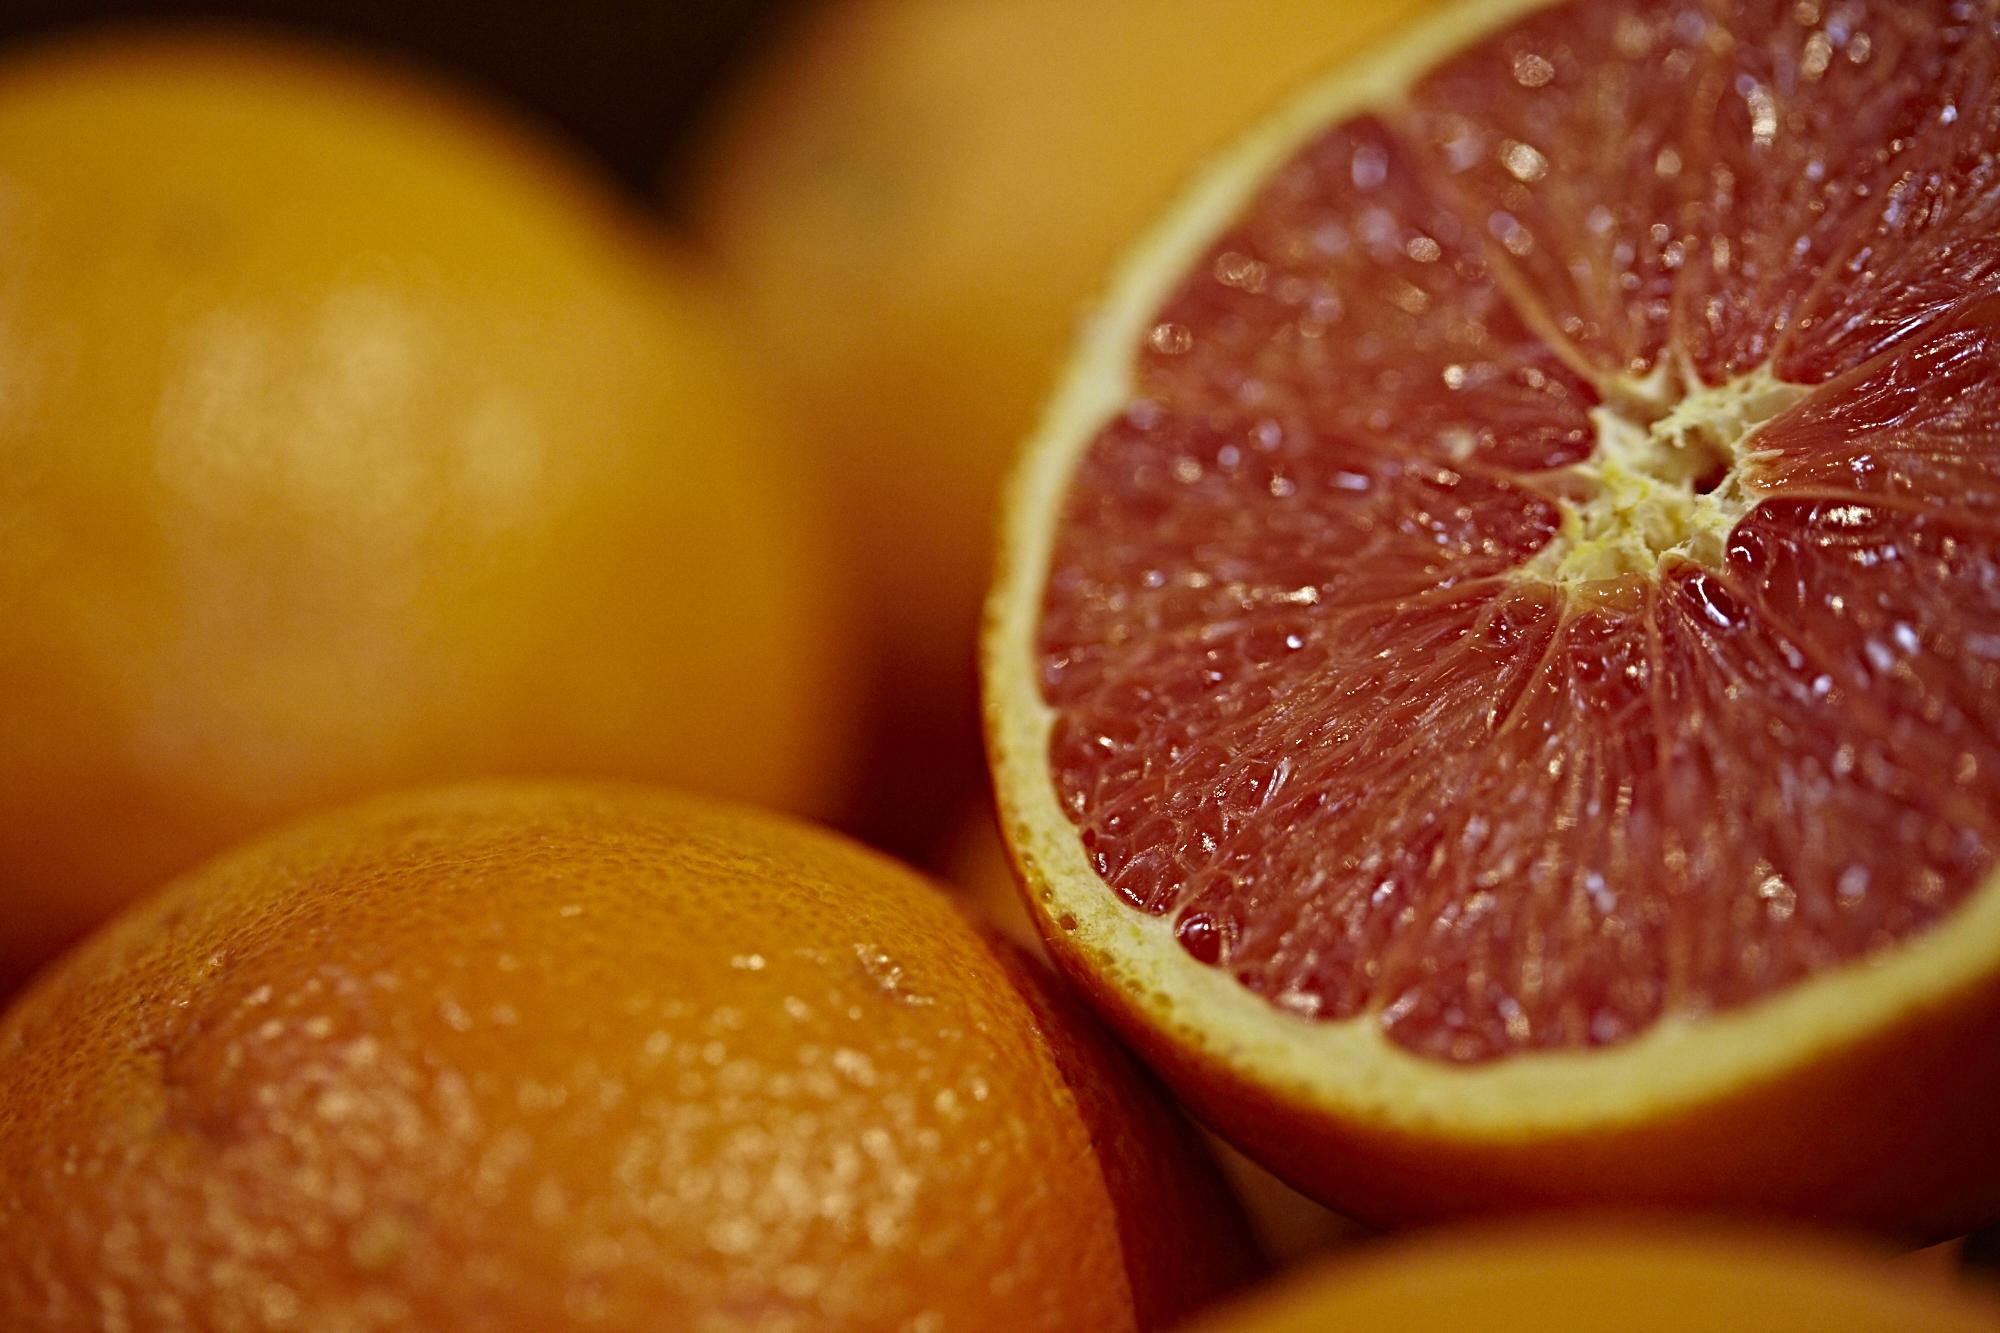 A picture of a juicy blood orange.jpg